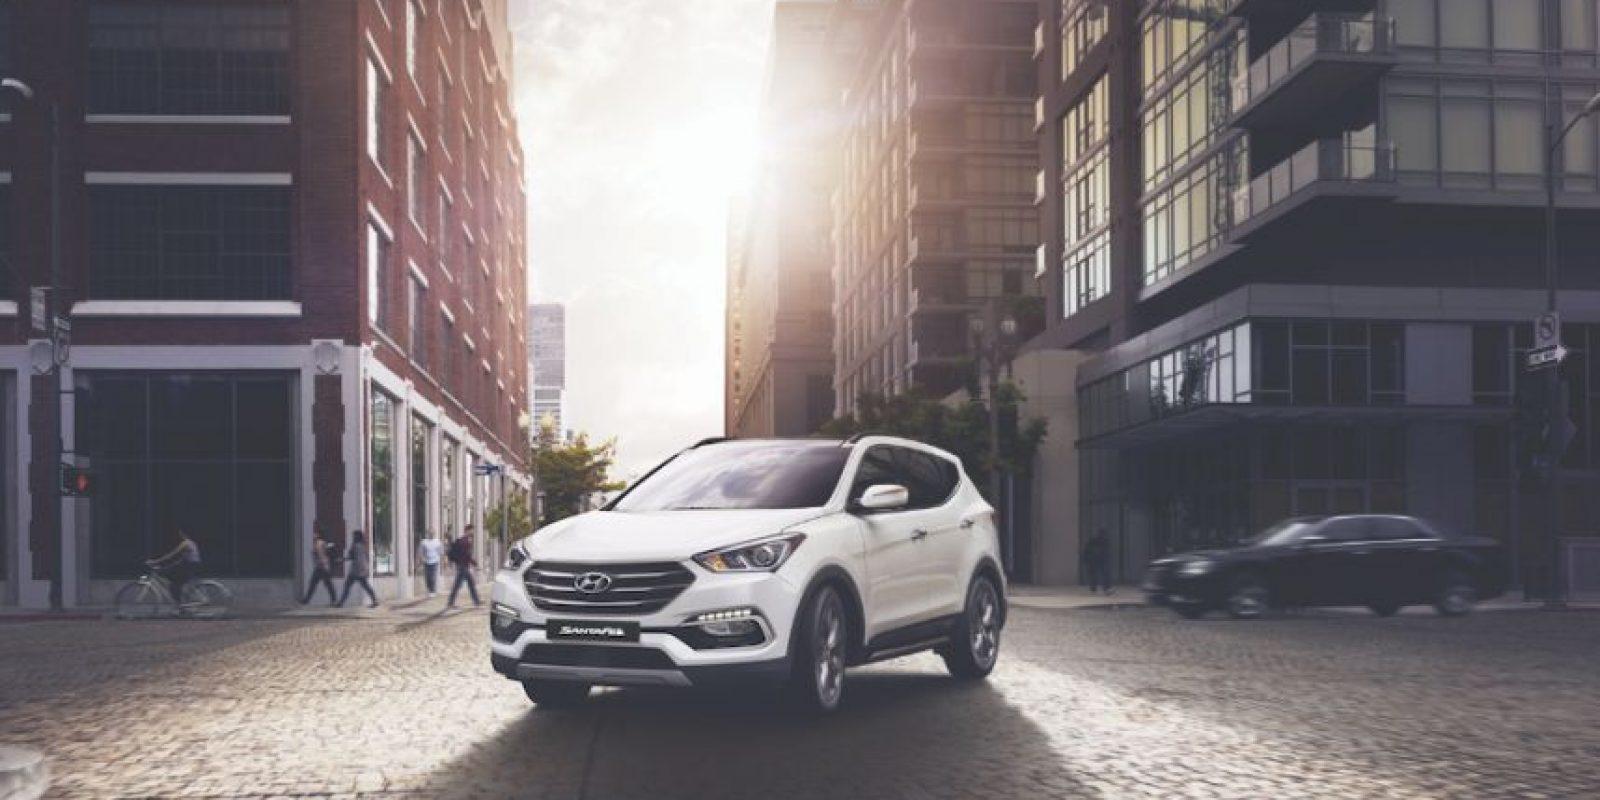 Foto:Hyundai